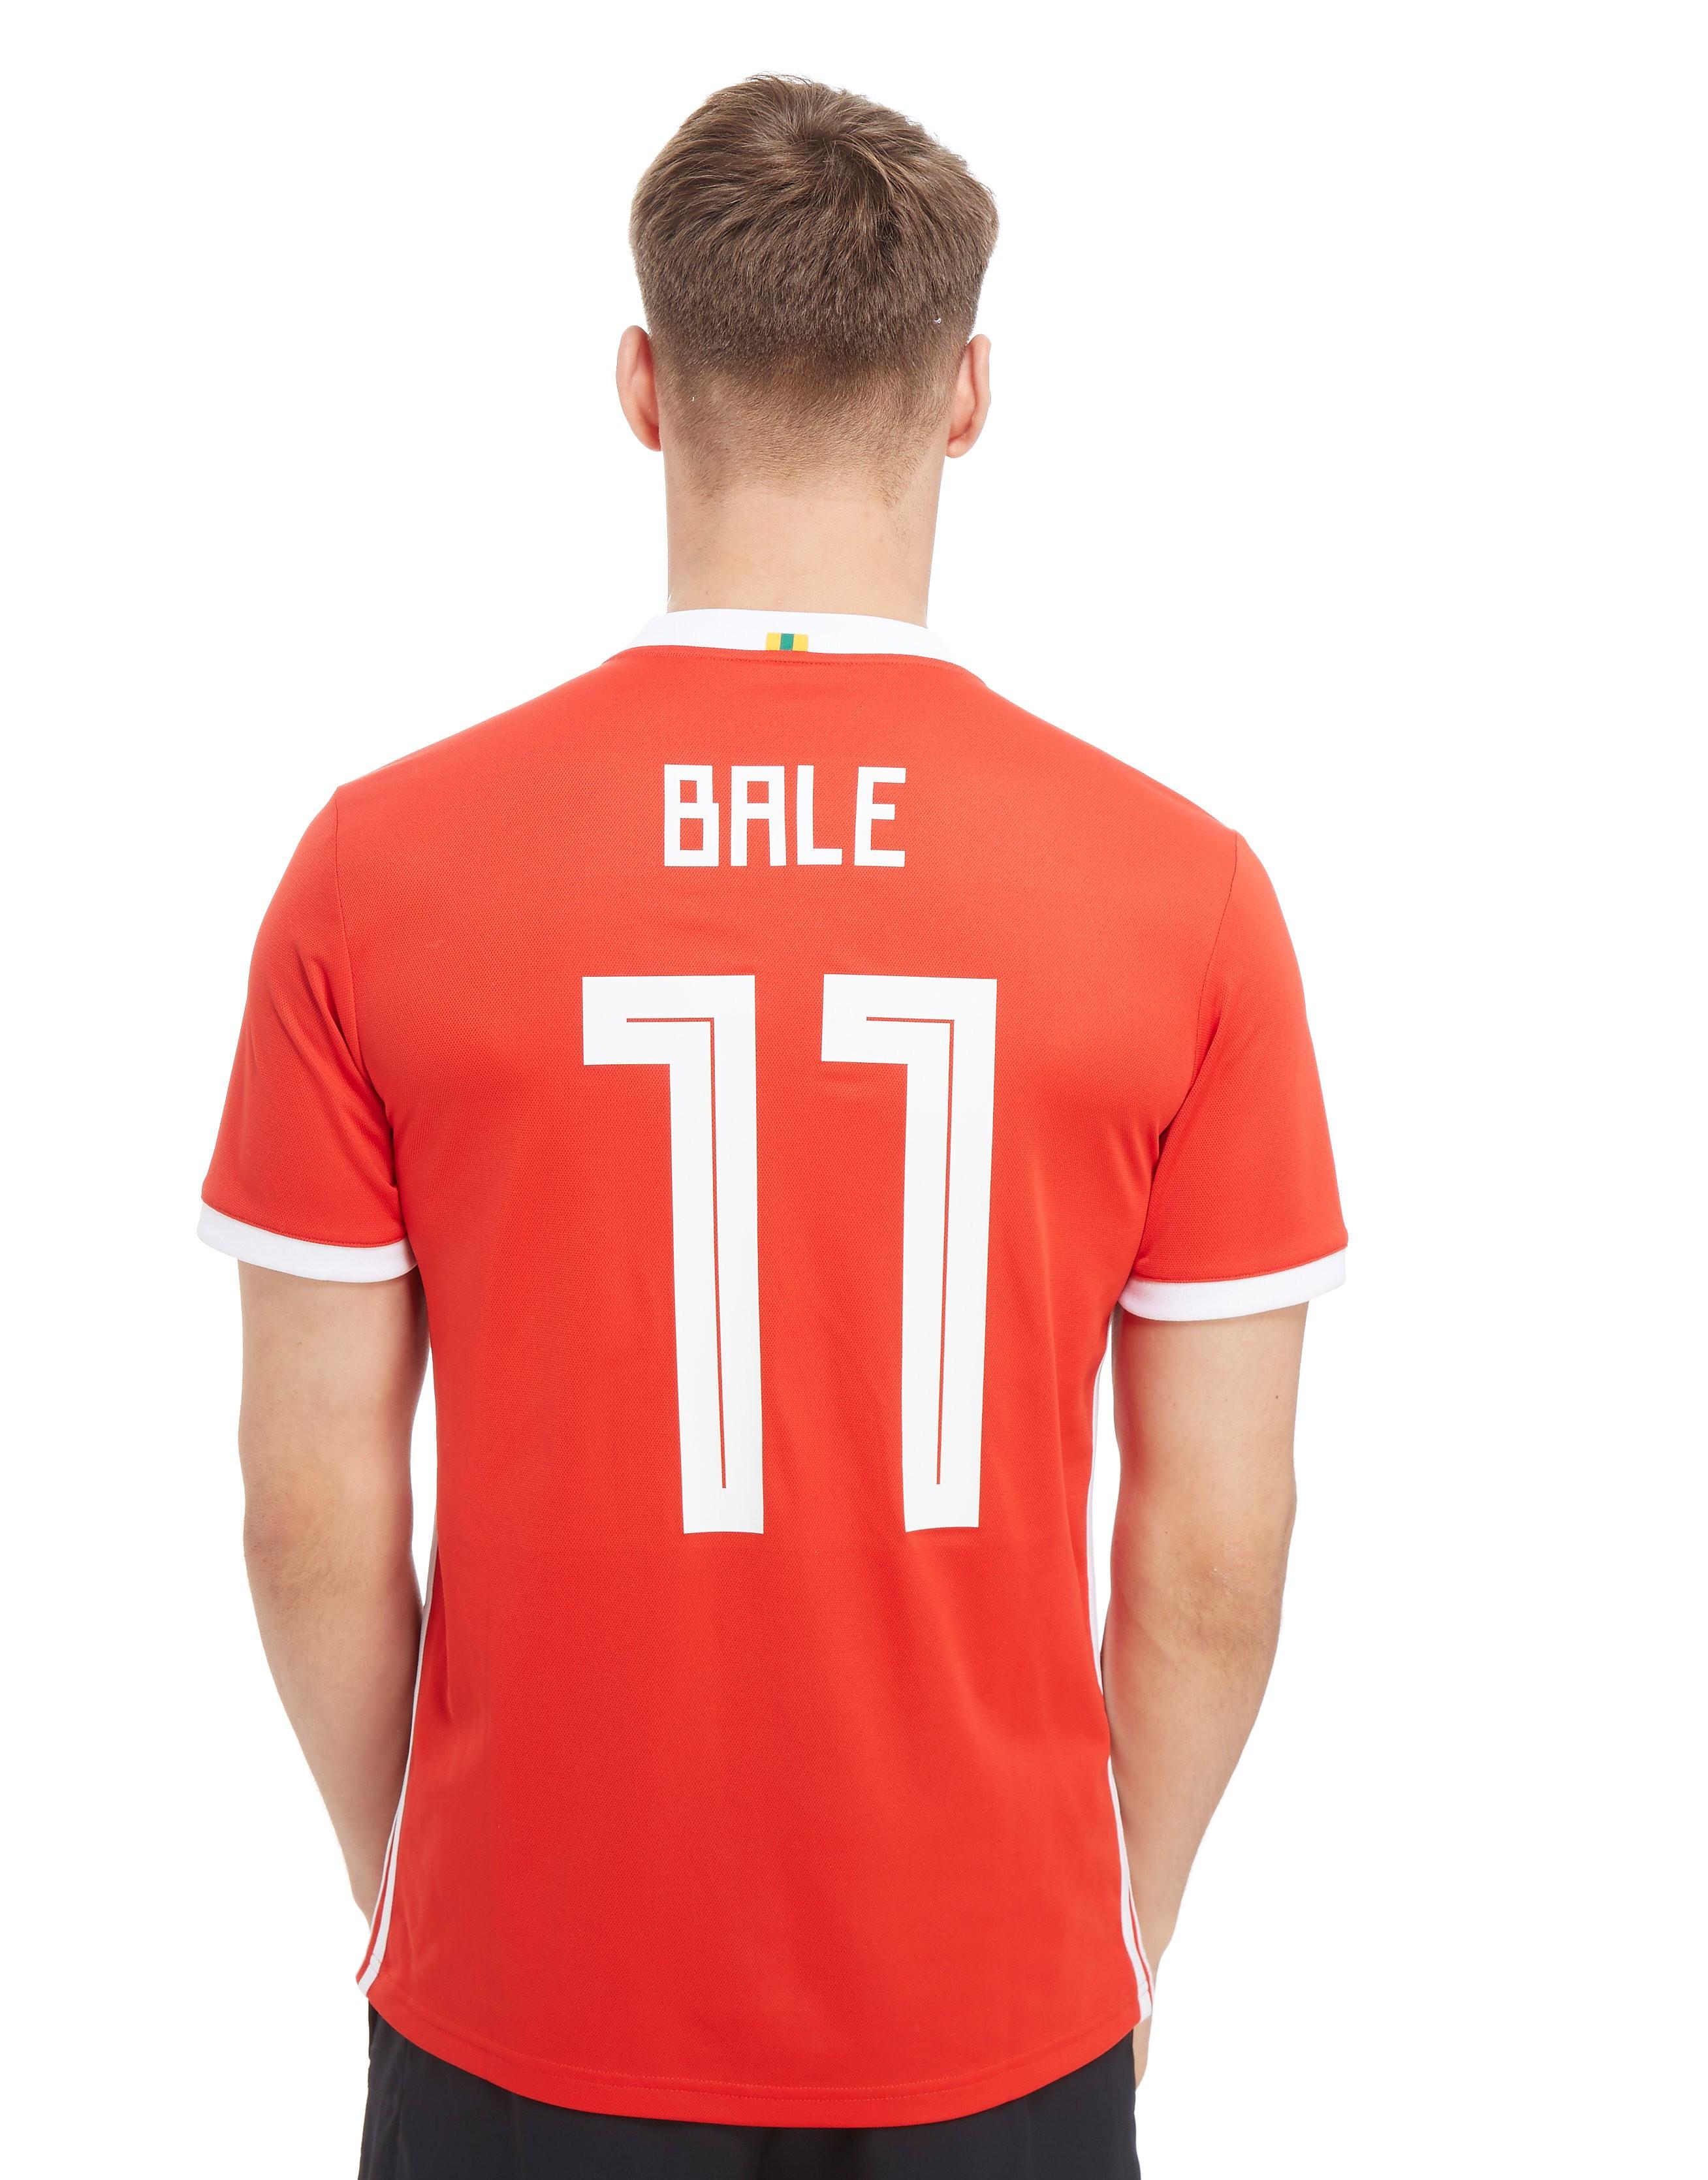 adidas Wales 2018 Home #11 Bale Shirt